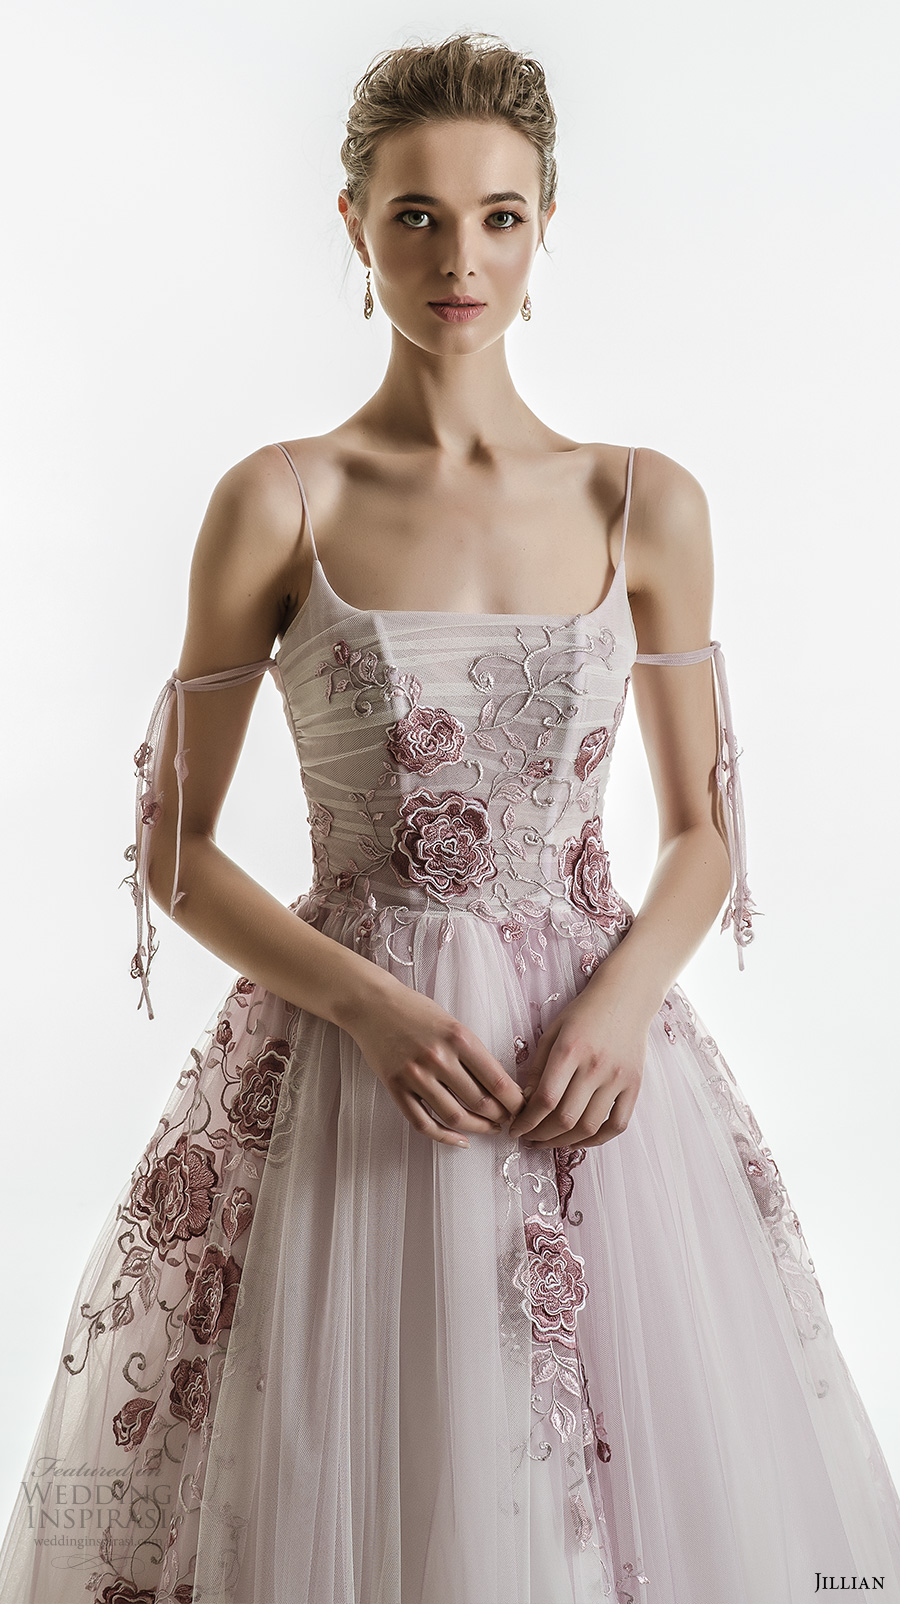 jillian 2018 bridal spagetti strap straight across neckline heavily embellished bodice tulle skirt romantic purple color wedding dress (30) zv